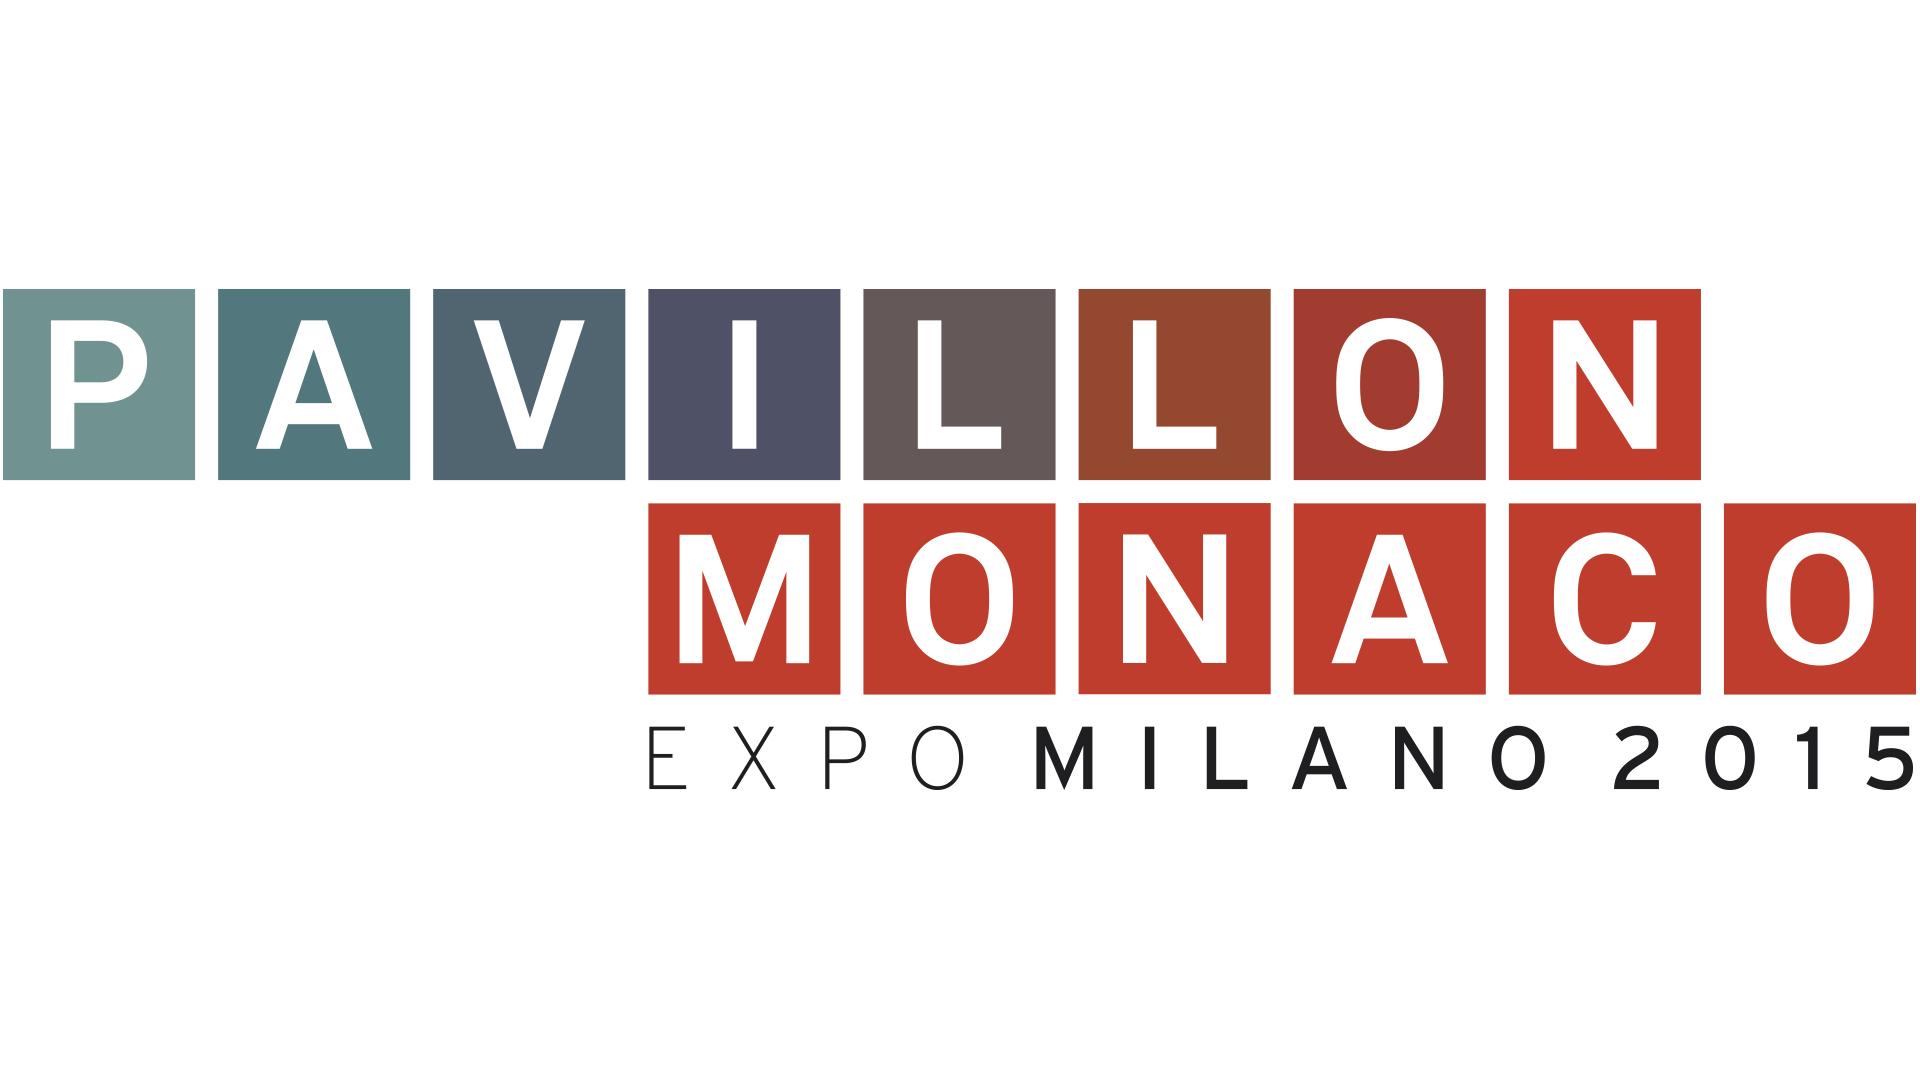 Building Monaco Pavilion @ EXPO 2015